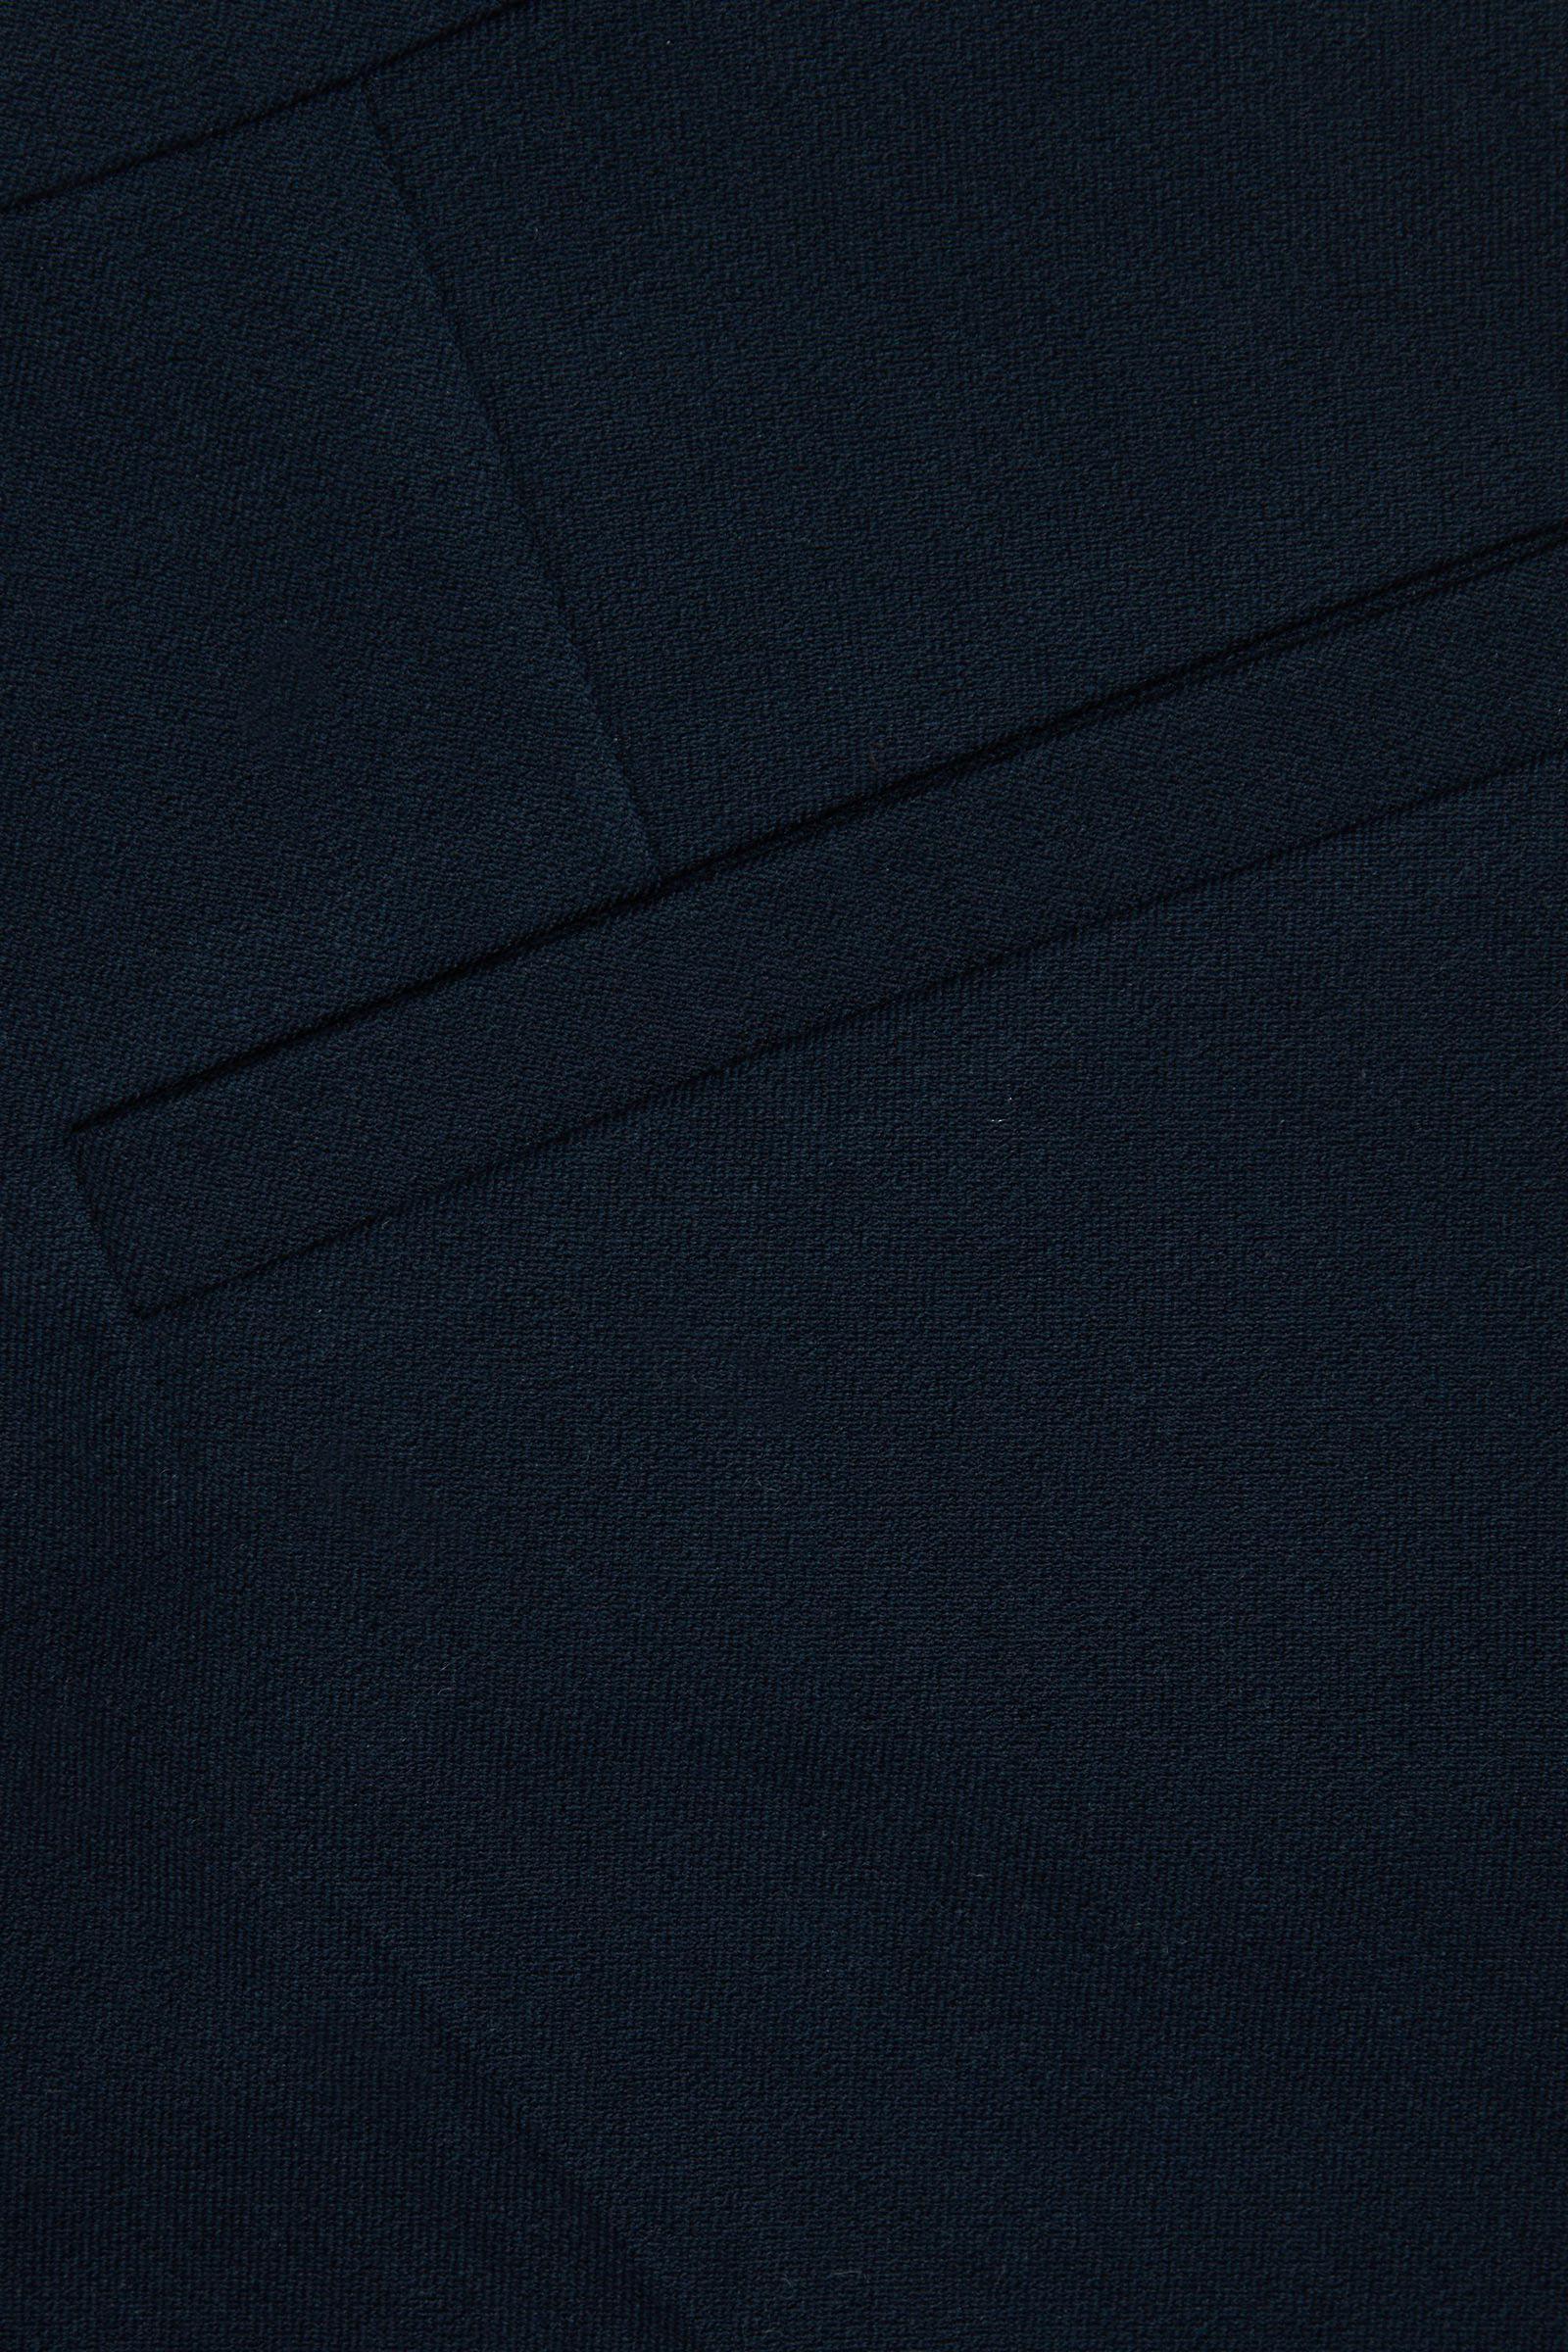 COS 오가닉 코튼 시가렛 트라우저의 네이비컬러 Detail입니다.